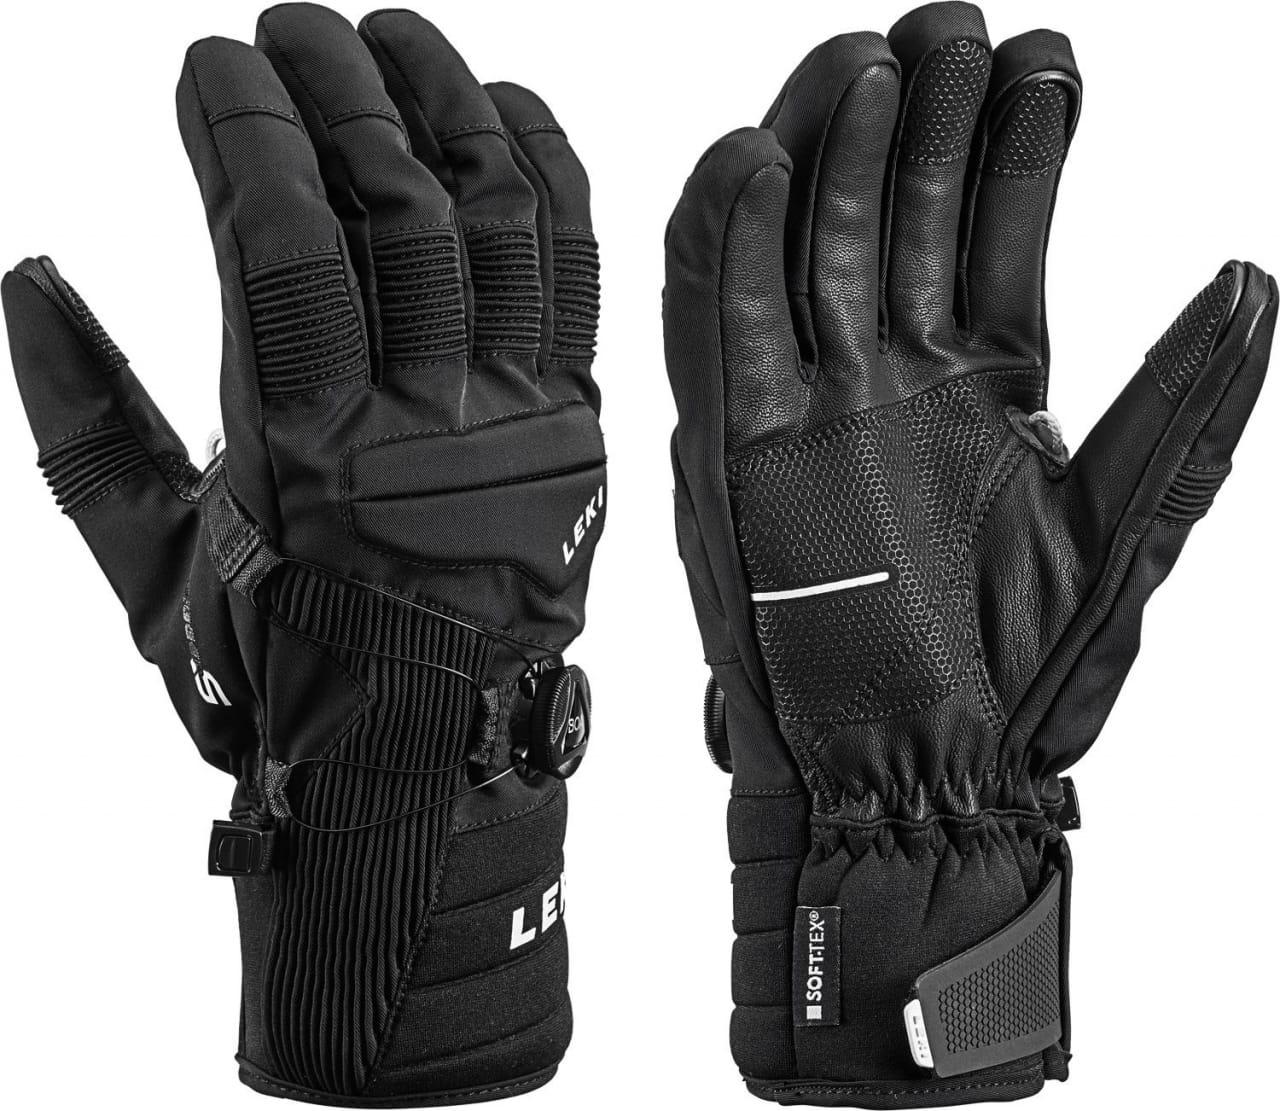 zimné rukavice Leki Progressive Tune S Boa mf touch